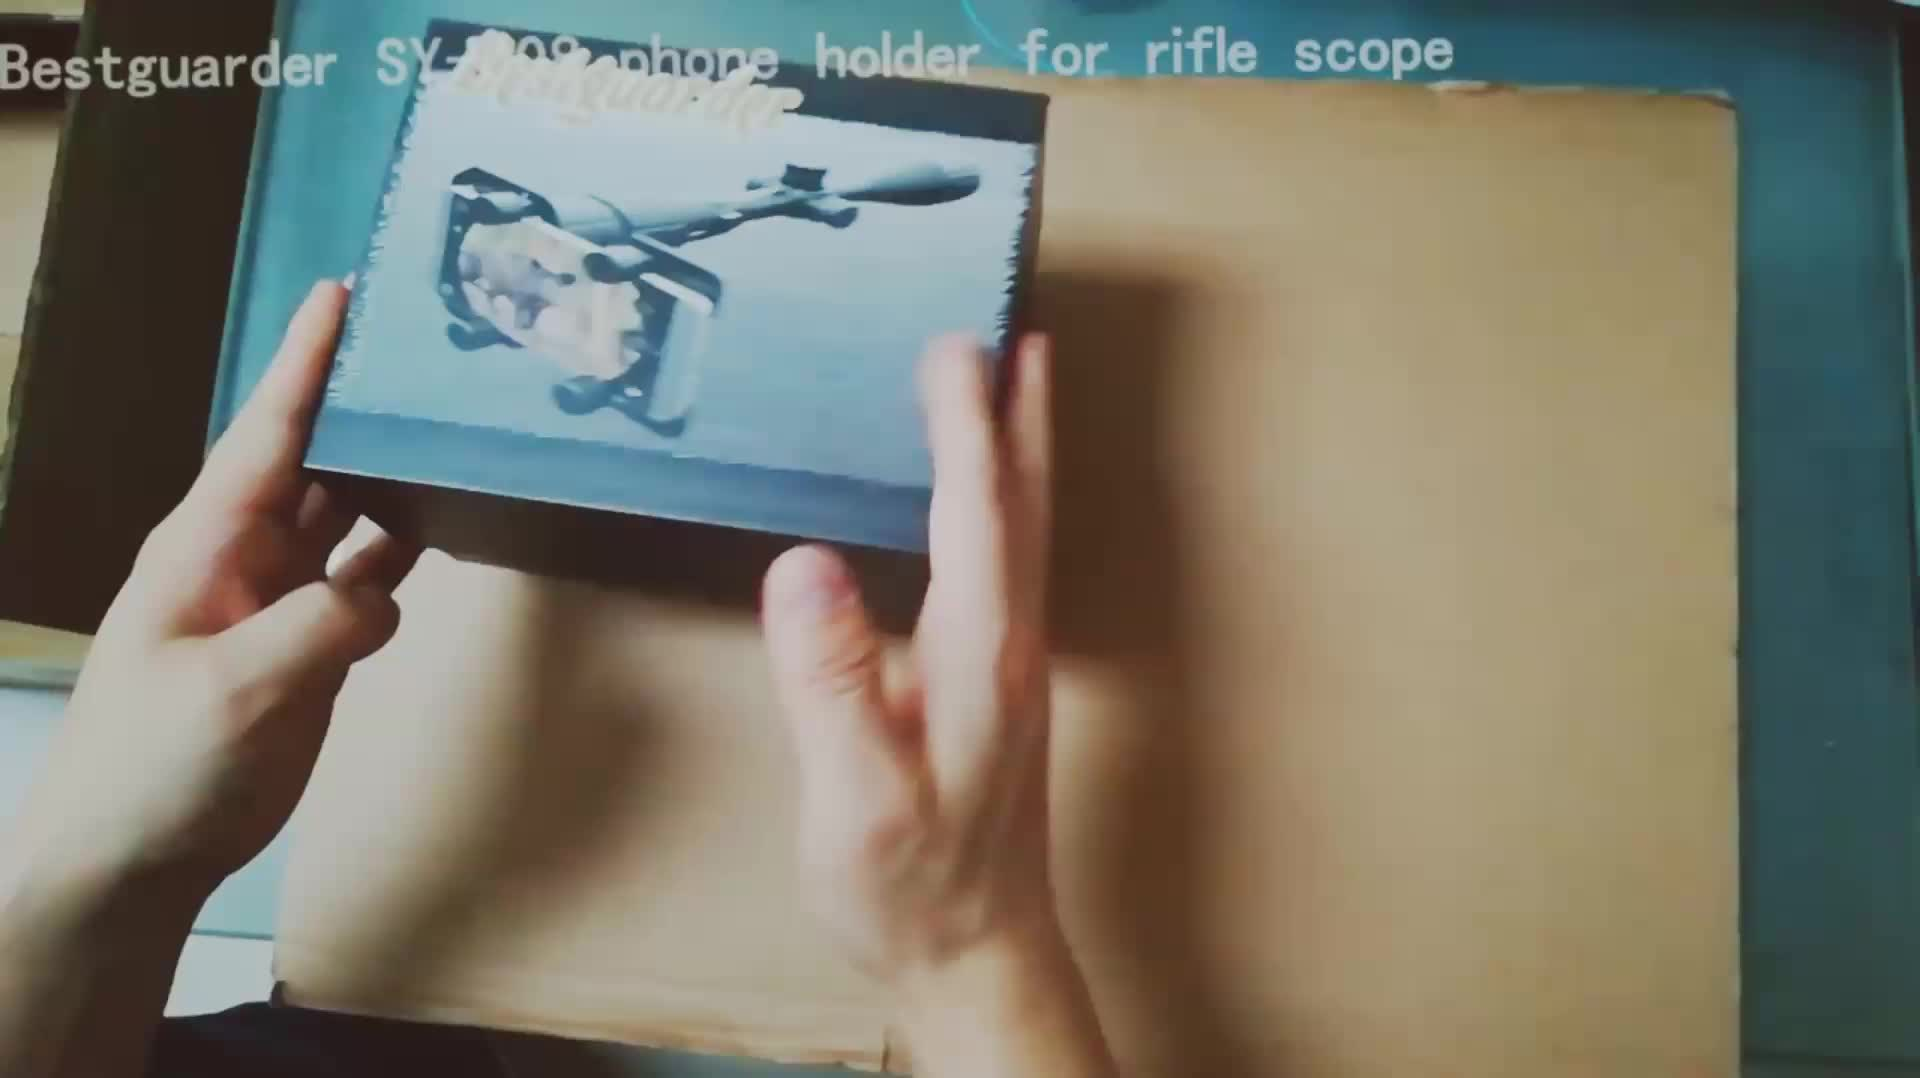 phone Scope adaptor Bestguarder